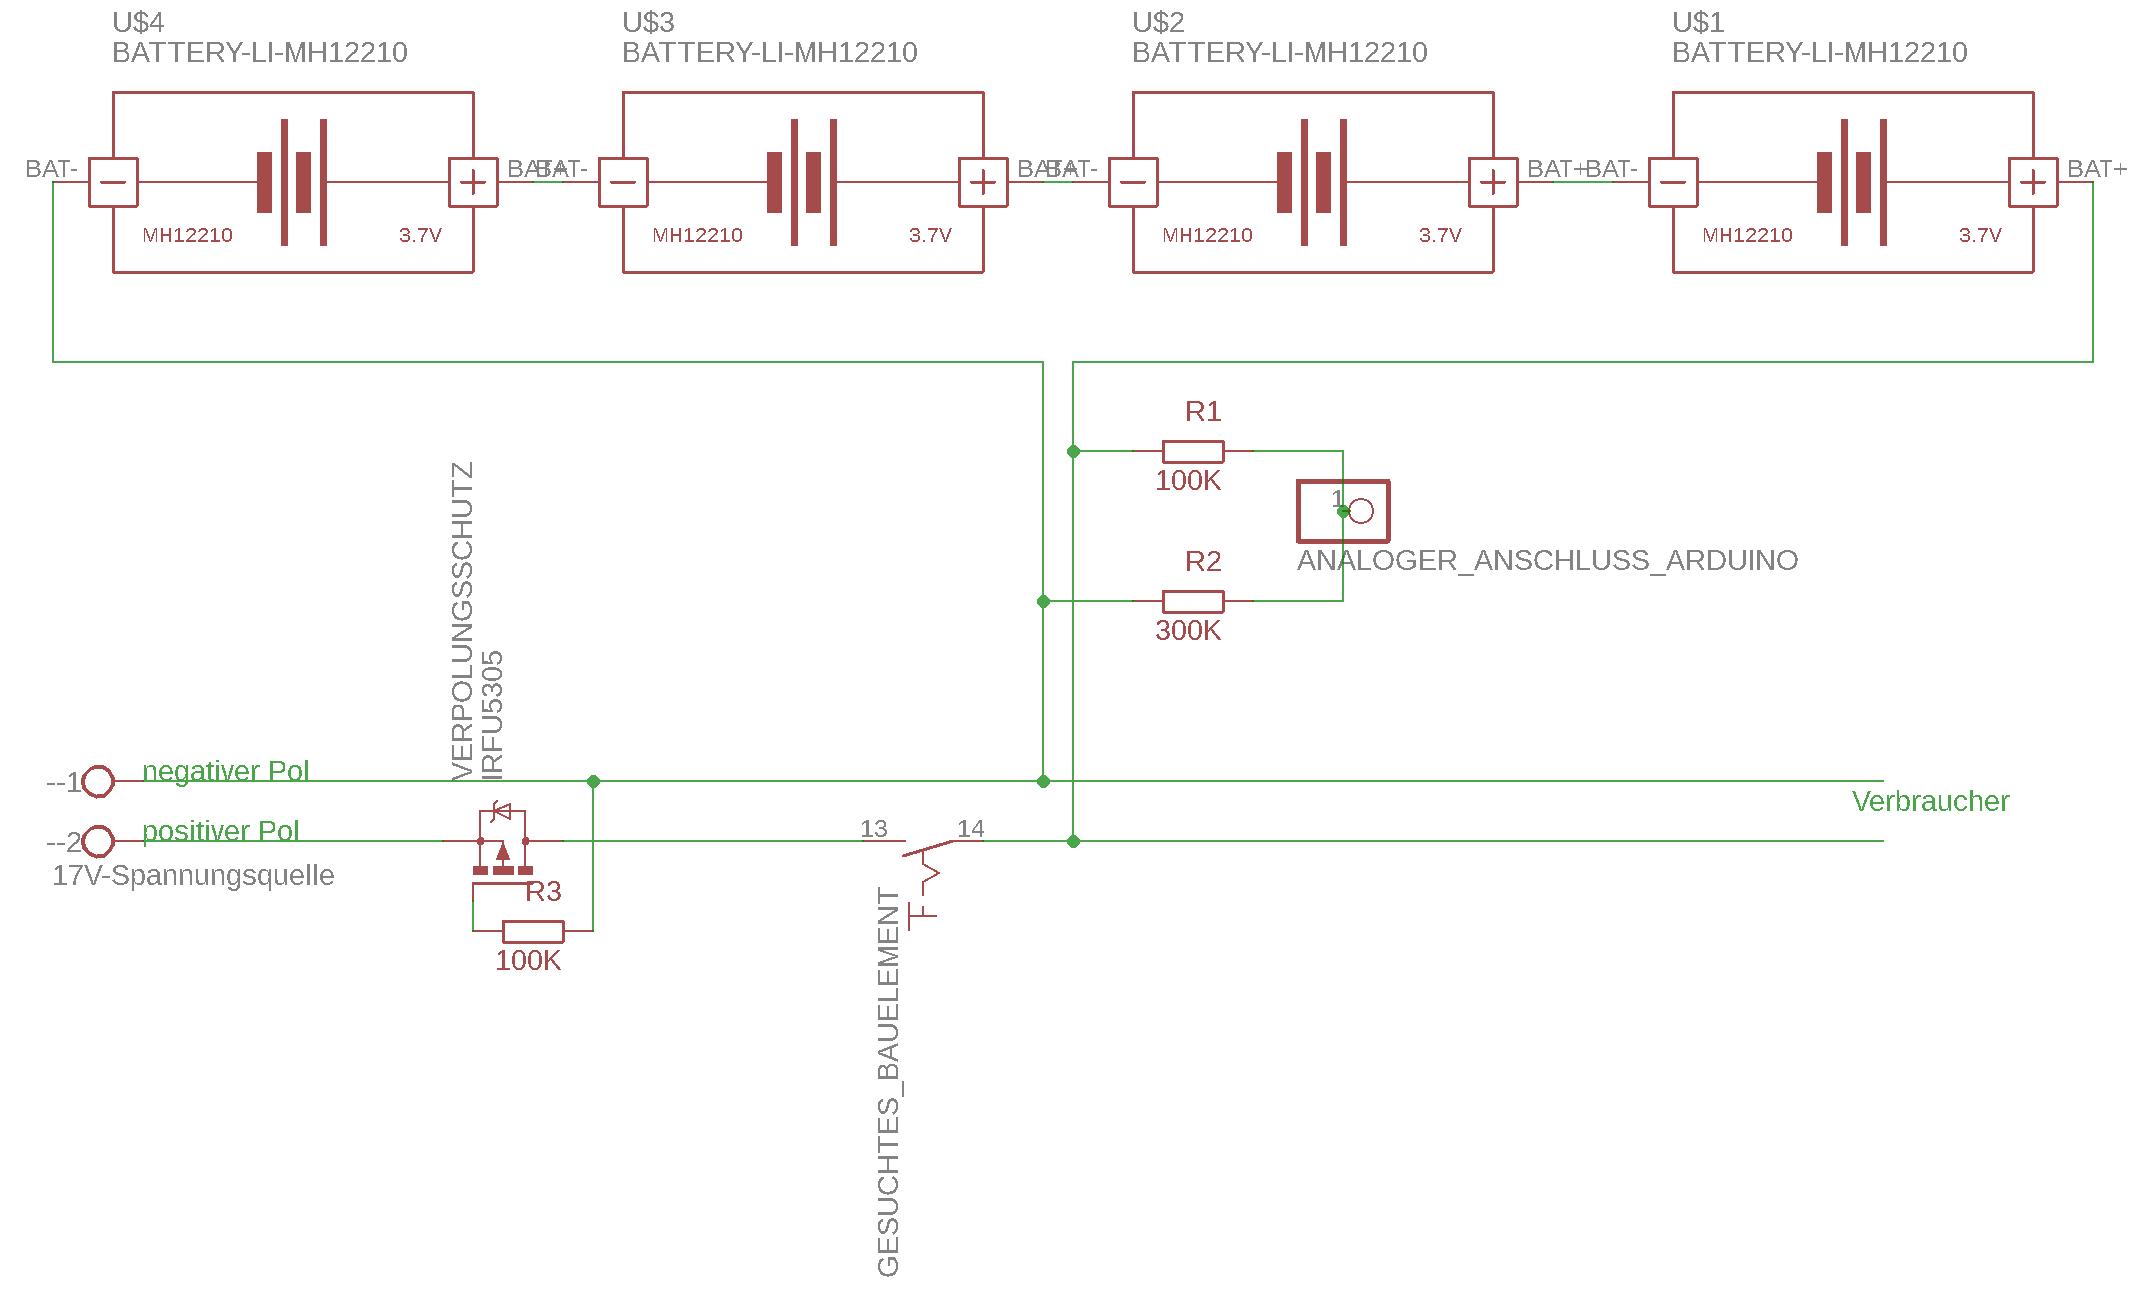 Feedback zu Schaltung benötigt - Mikrocontroller.net